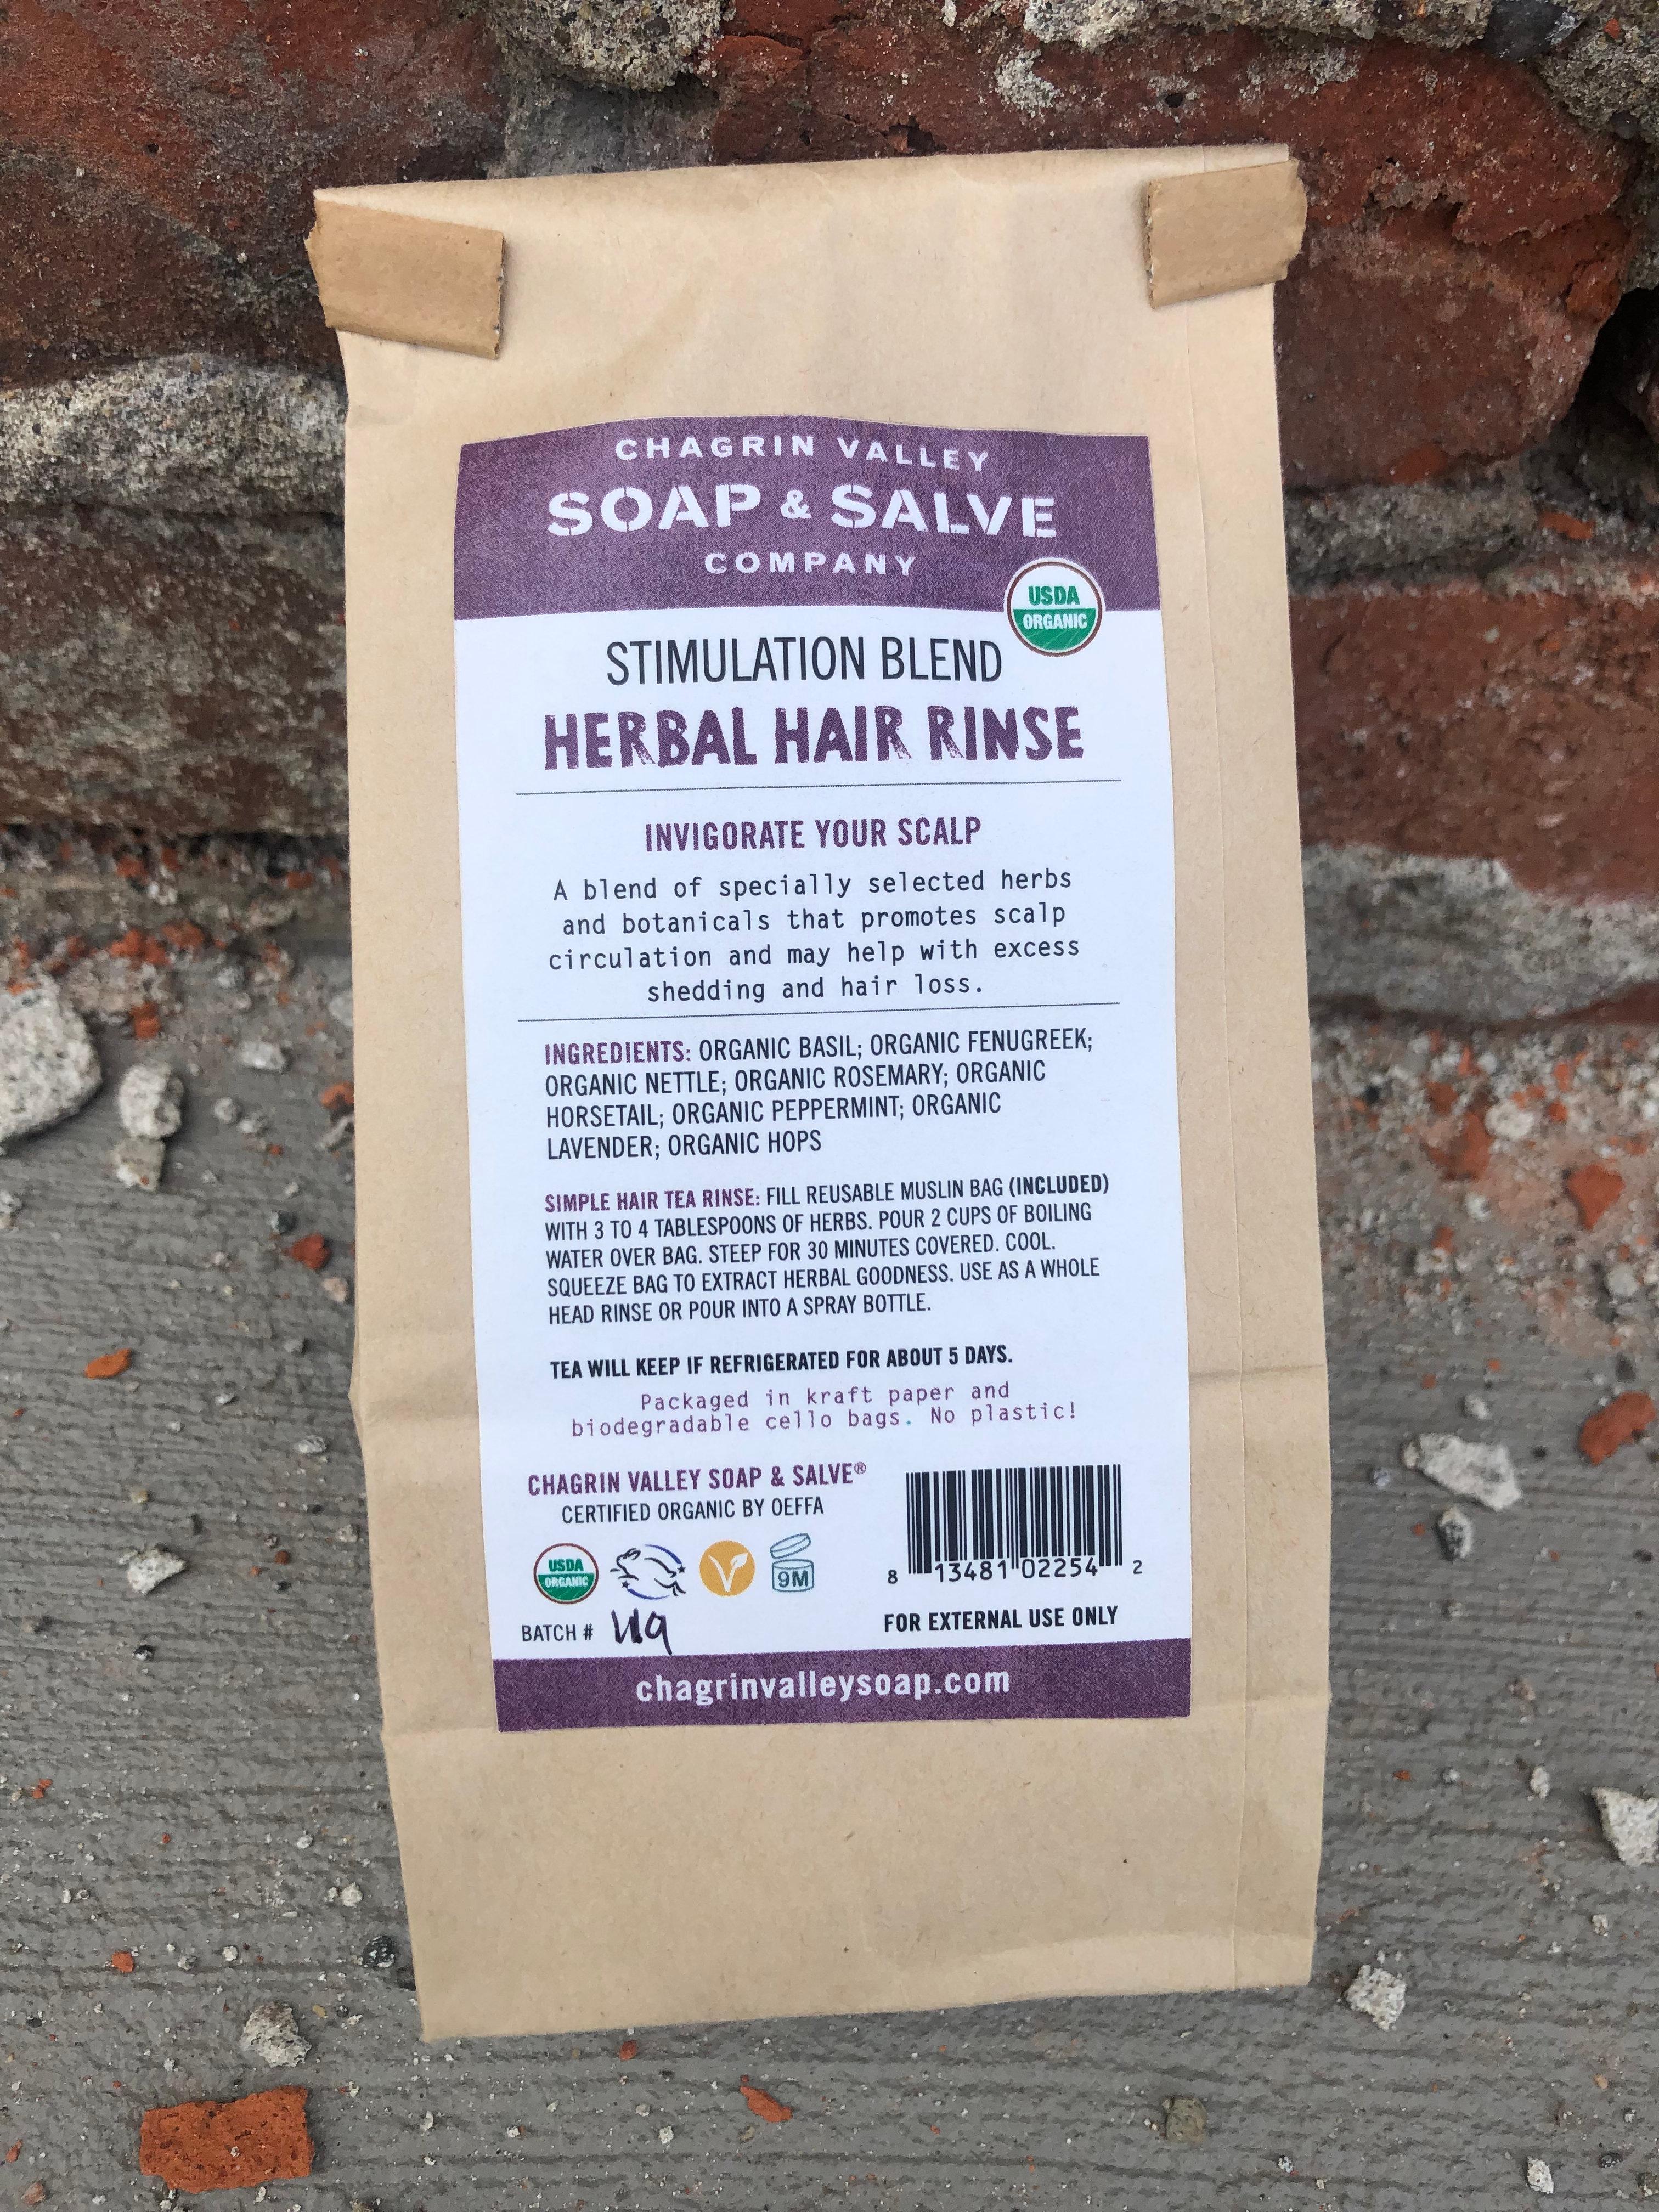 Chagrin Valley Stimulation Blend Herbal Hair Rinse